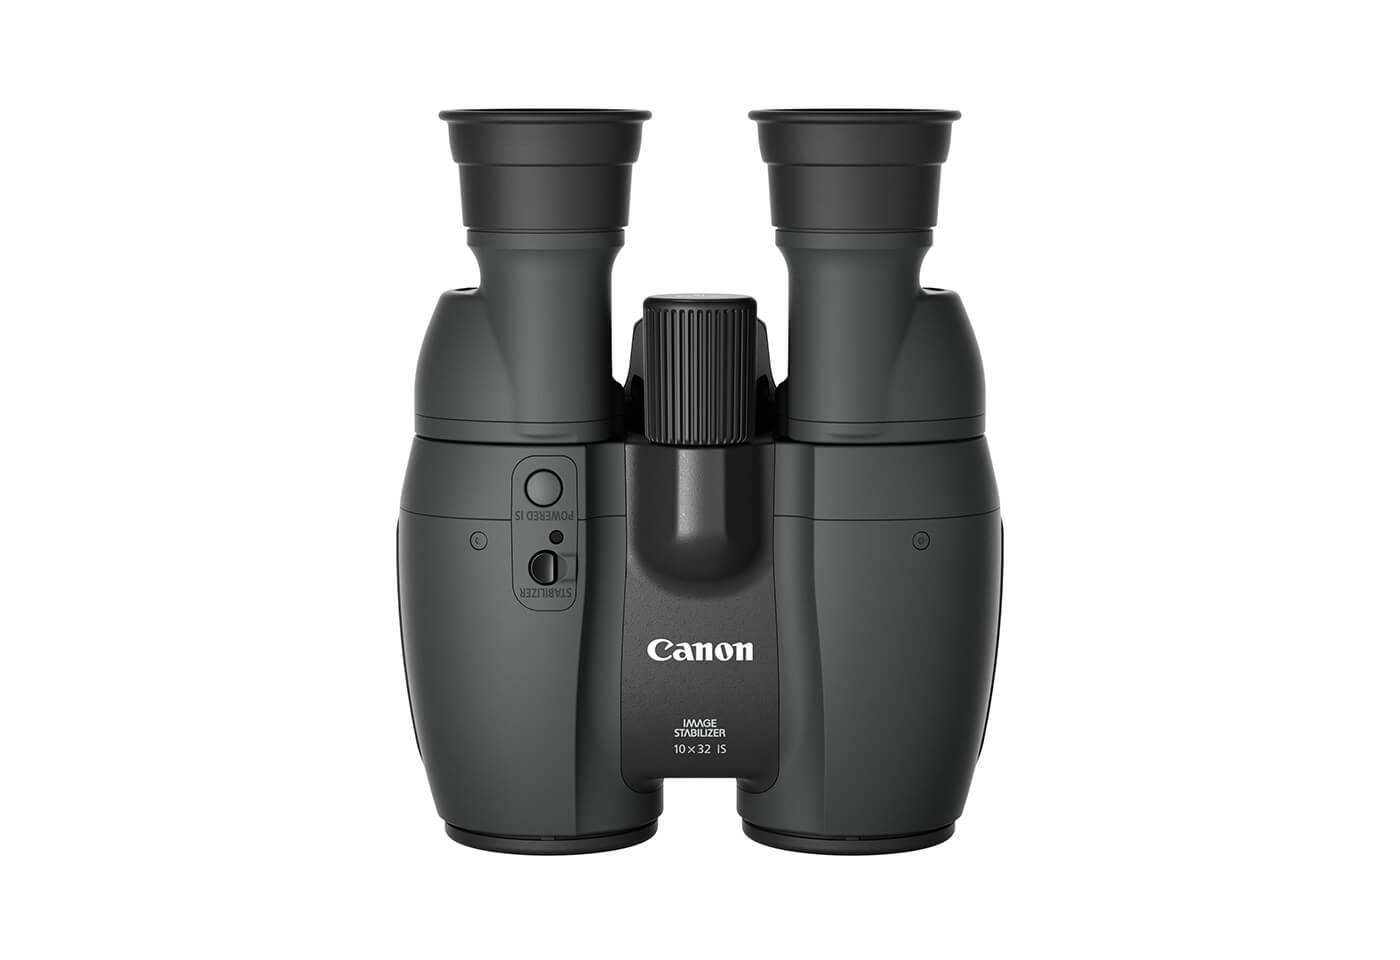 Canon 10x32 binoculars front image